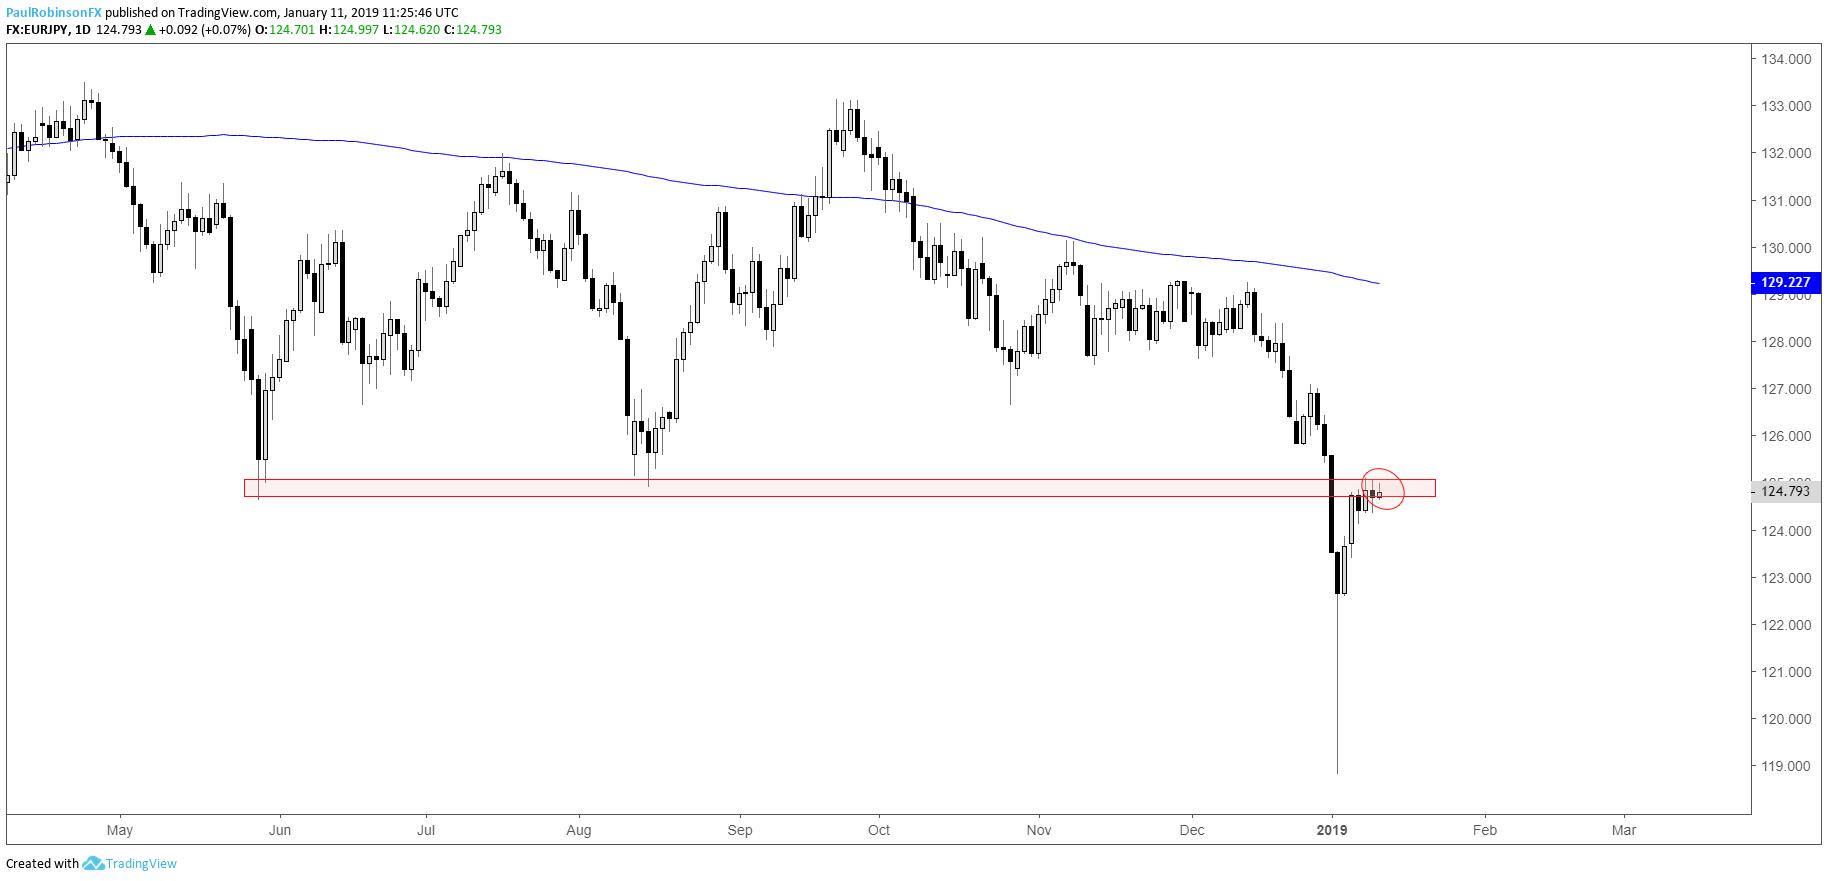 Â¥ In EUR